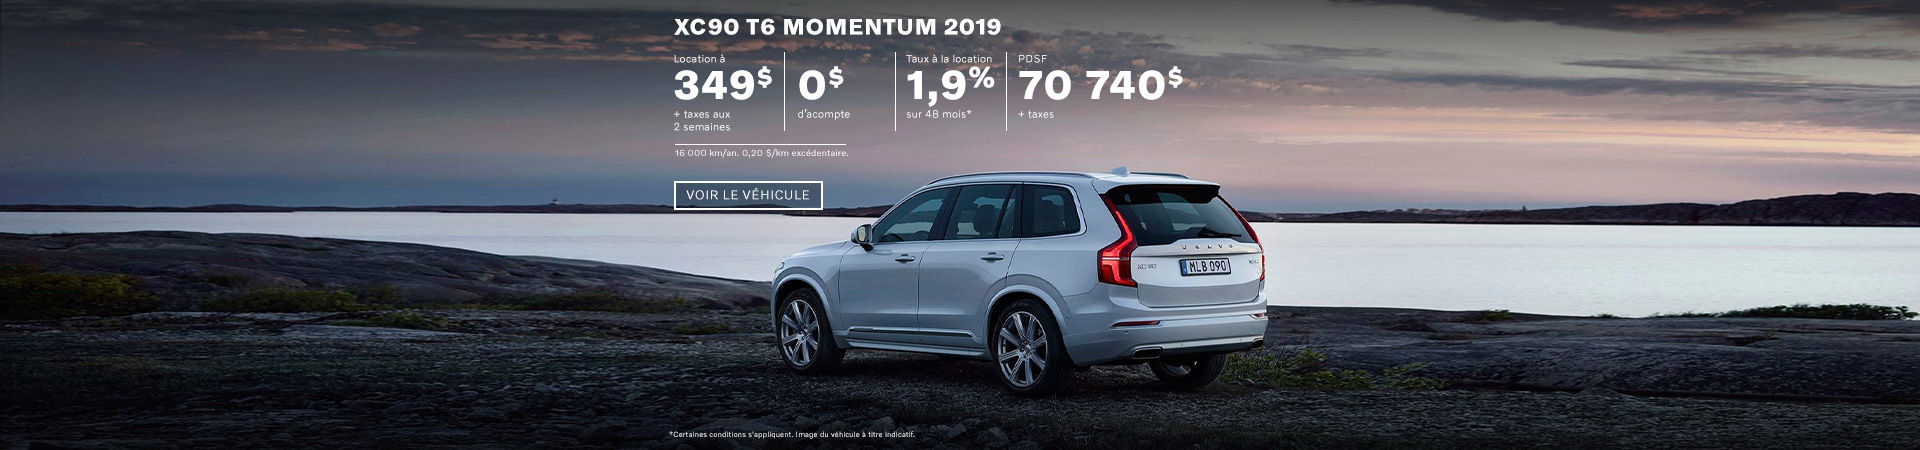 XC90 T6 Momentum 2019